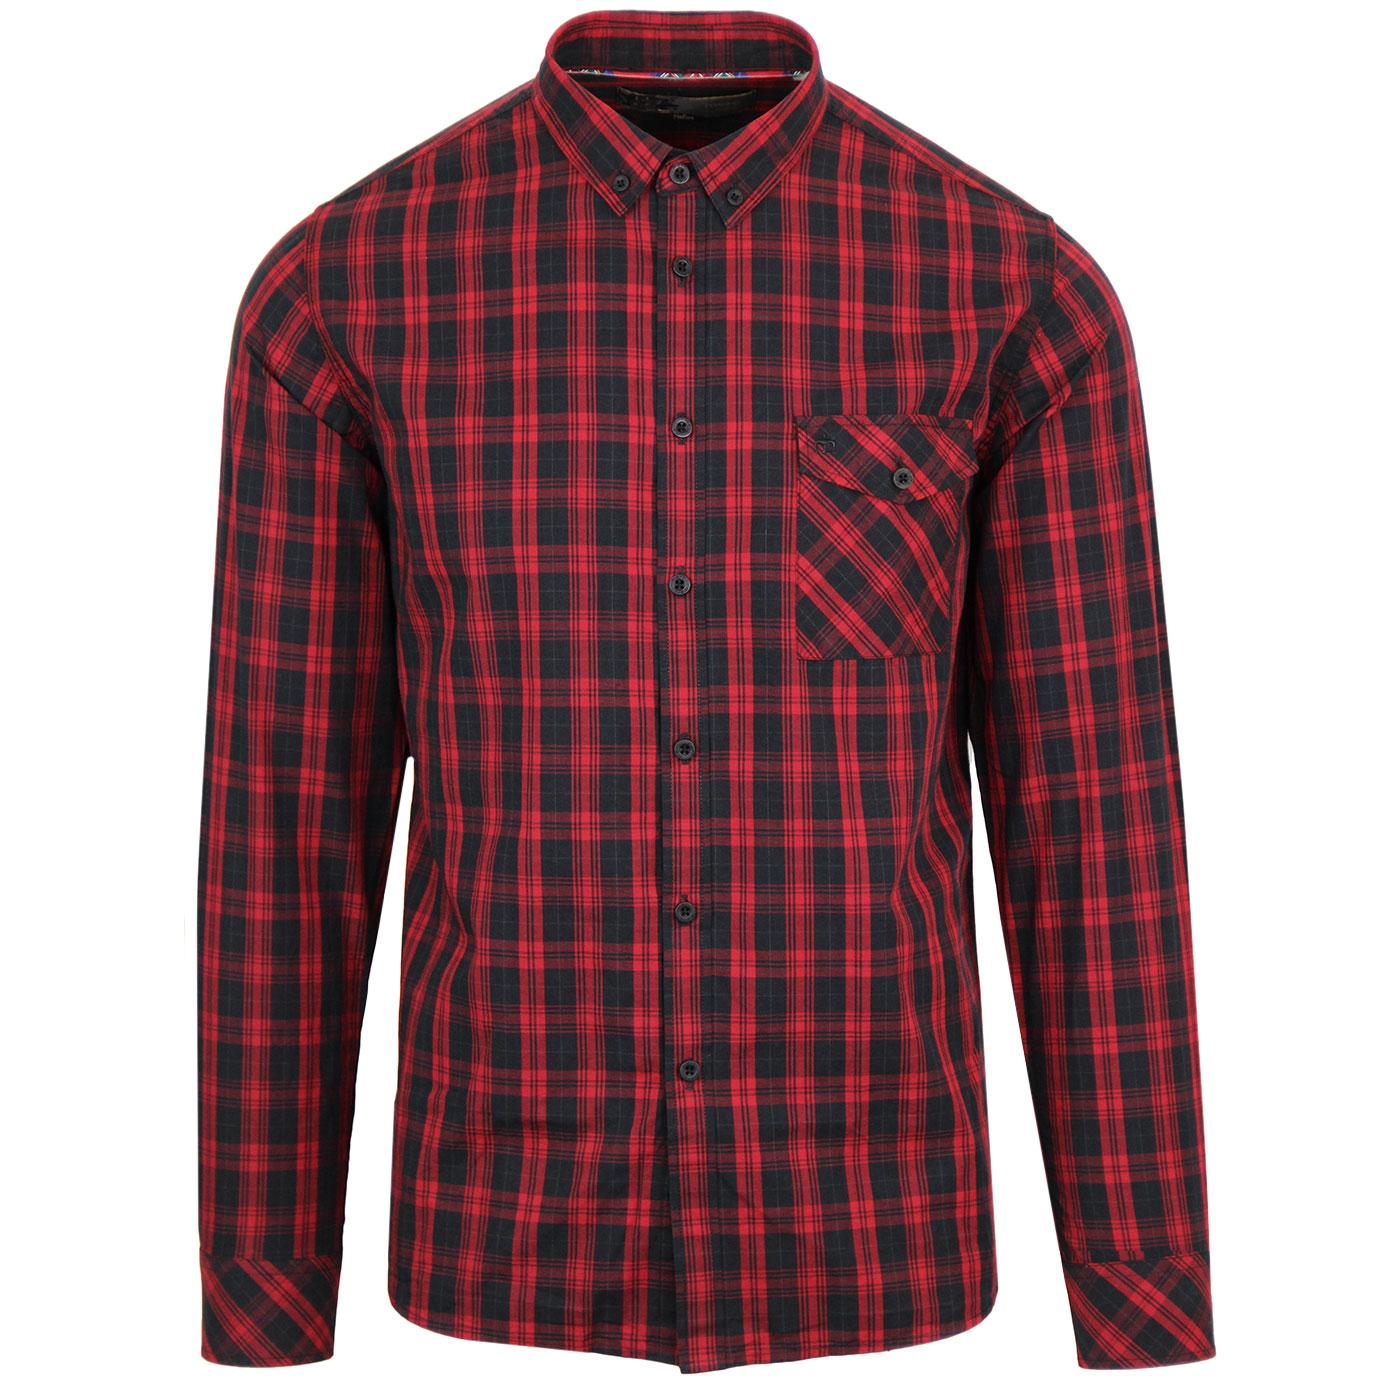 Brixton MERC Retro Mod Button Down Check Shirt RED